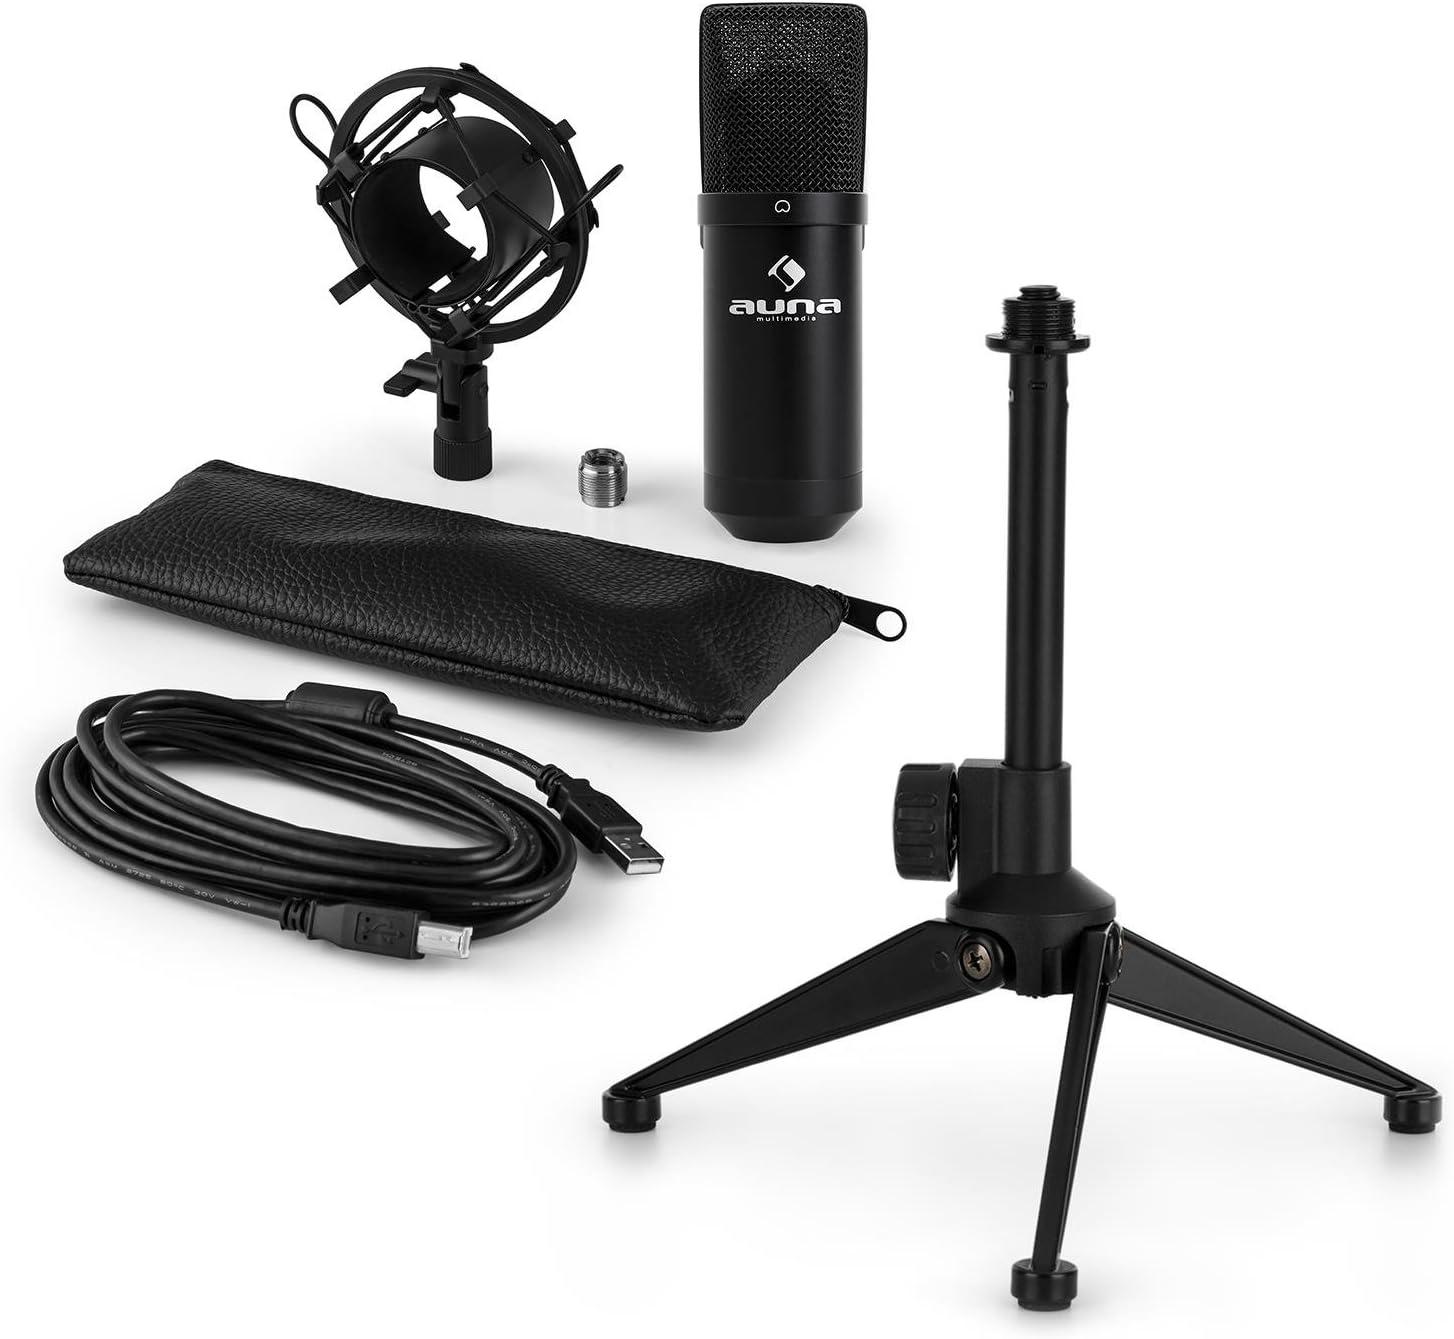 auna MIC-900B - USB Mikrofon-Set V1, Kondensatormikrofon + Mikrofon-Tischständer,  Nierencharakteristik, USB, Plug & Play, perfekte Haltteeigenschaft,  Höhenverstellbar, rutschfest, schwarz: Amazon.de: Musikinstrumente